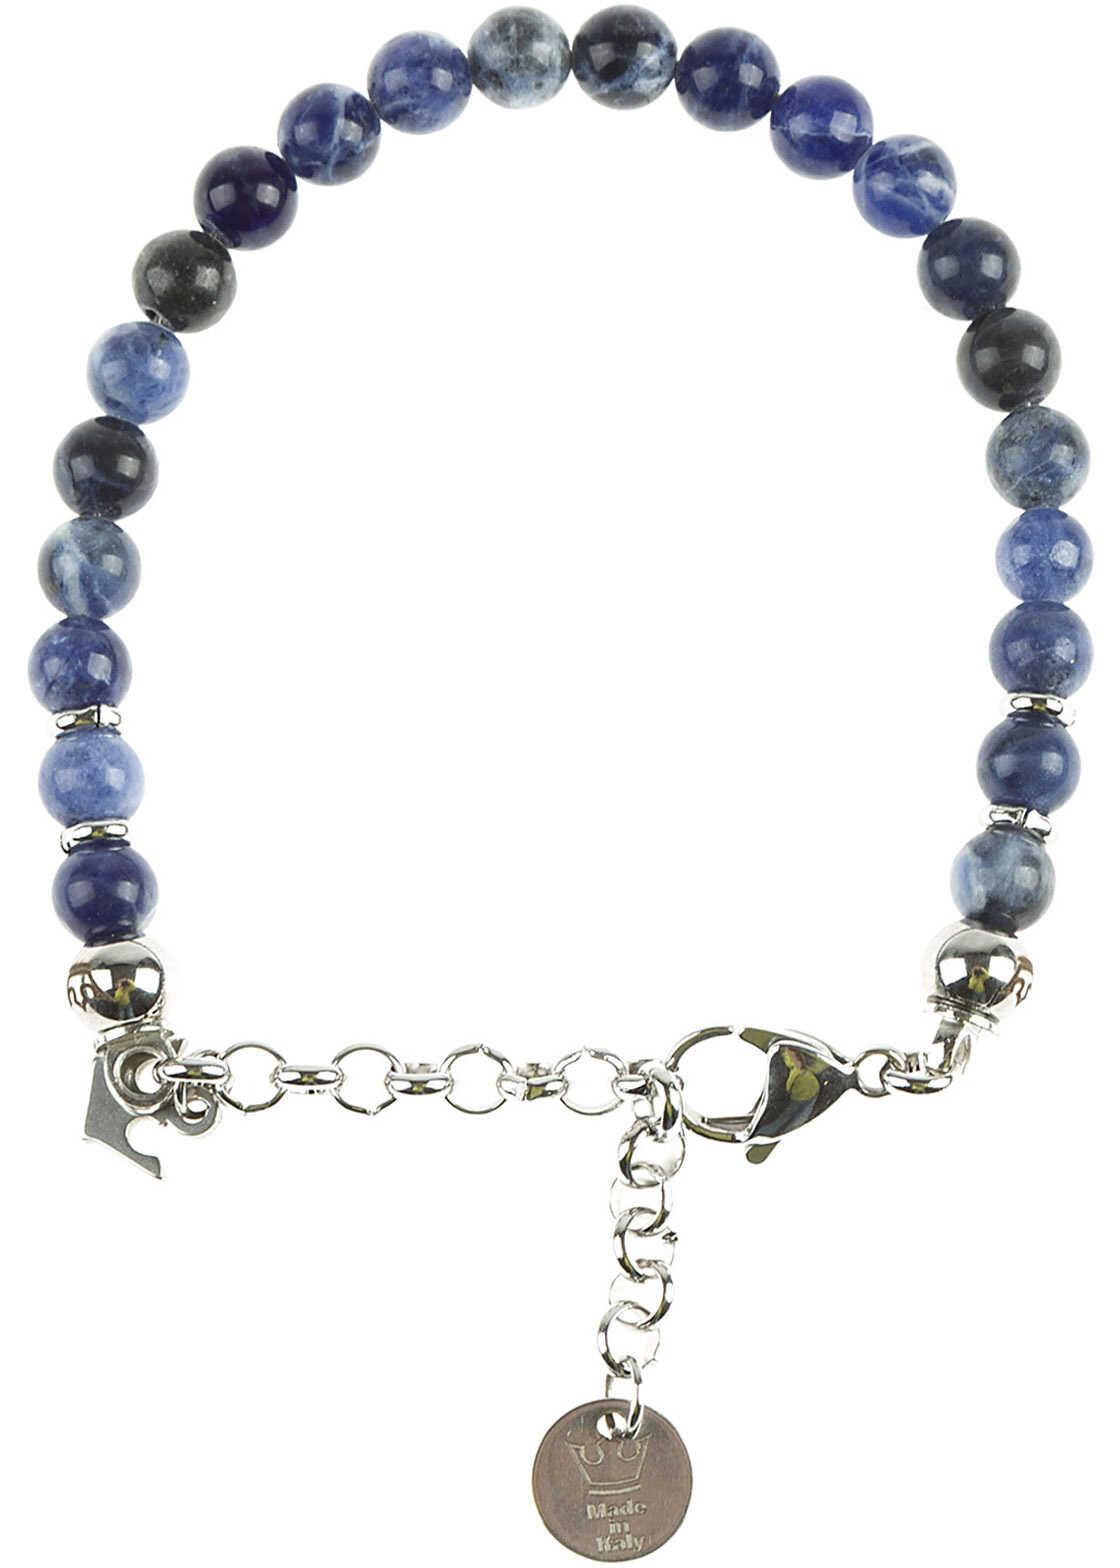 d'Este Bracelet Sodalite Purple